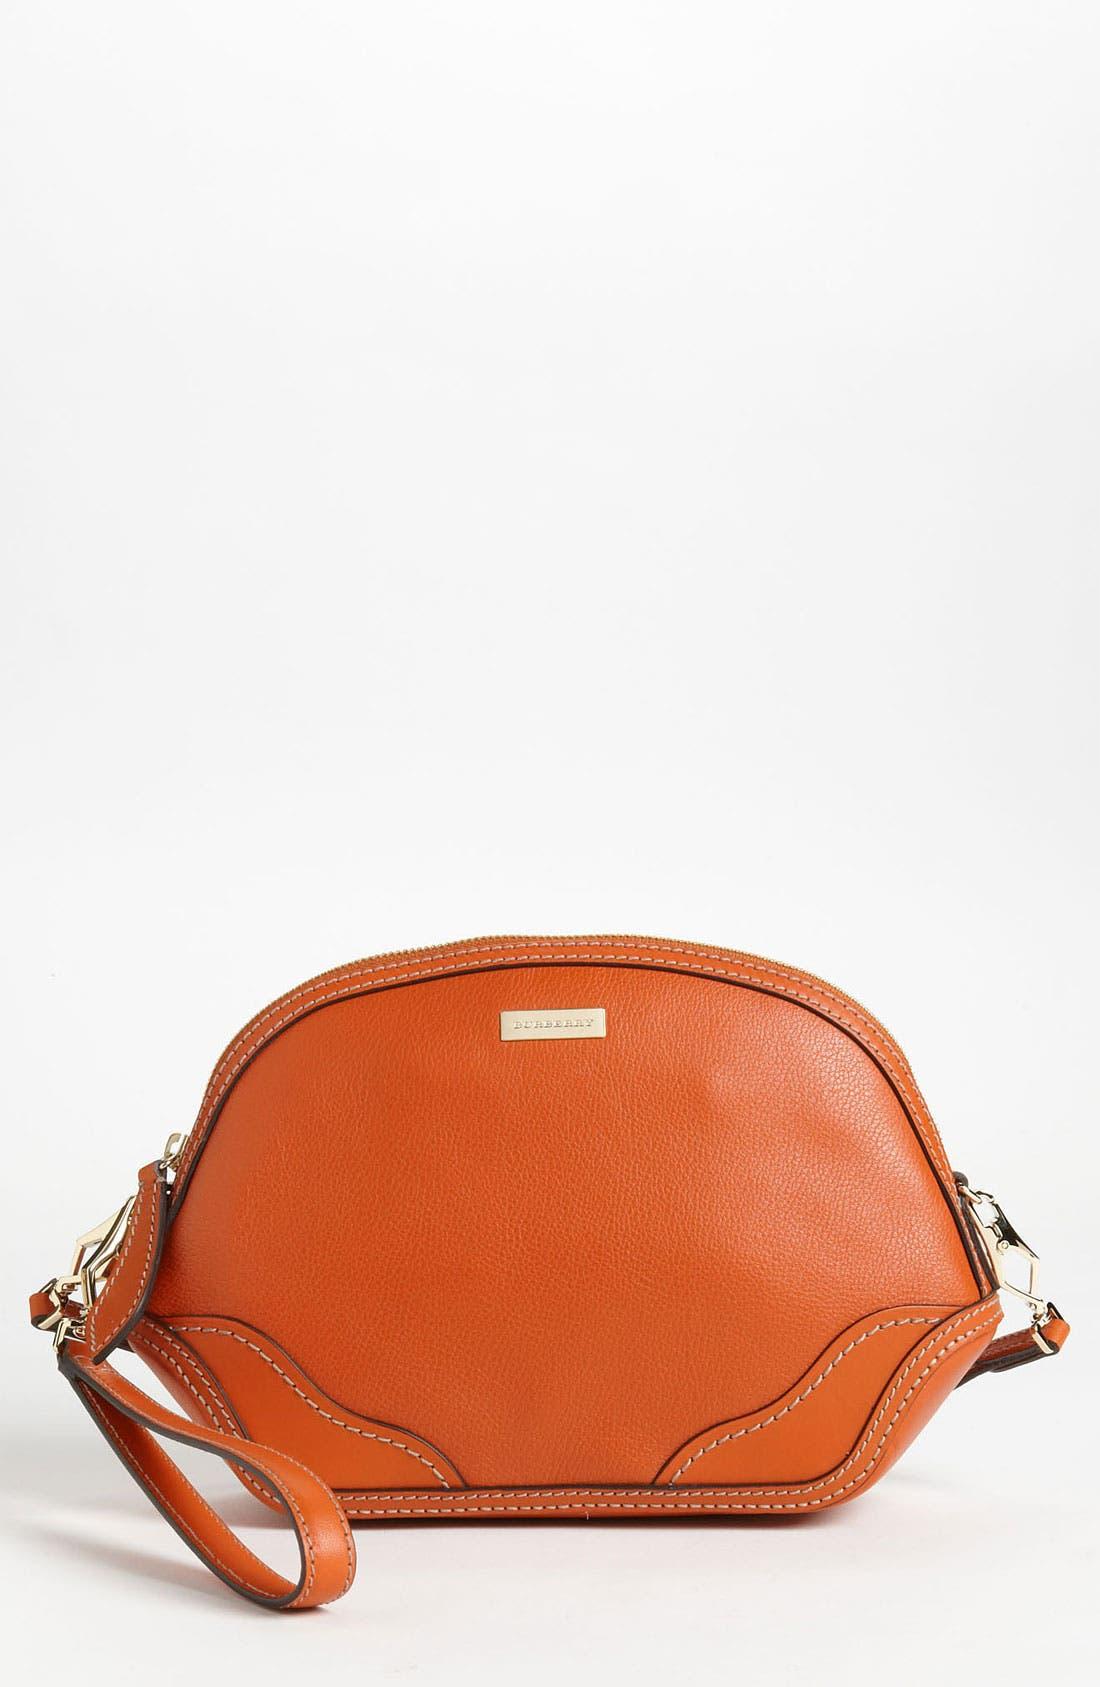 Main Image - Burberry 'Classic Grainy' Leather Crossbody Bag